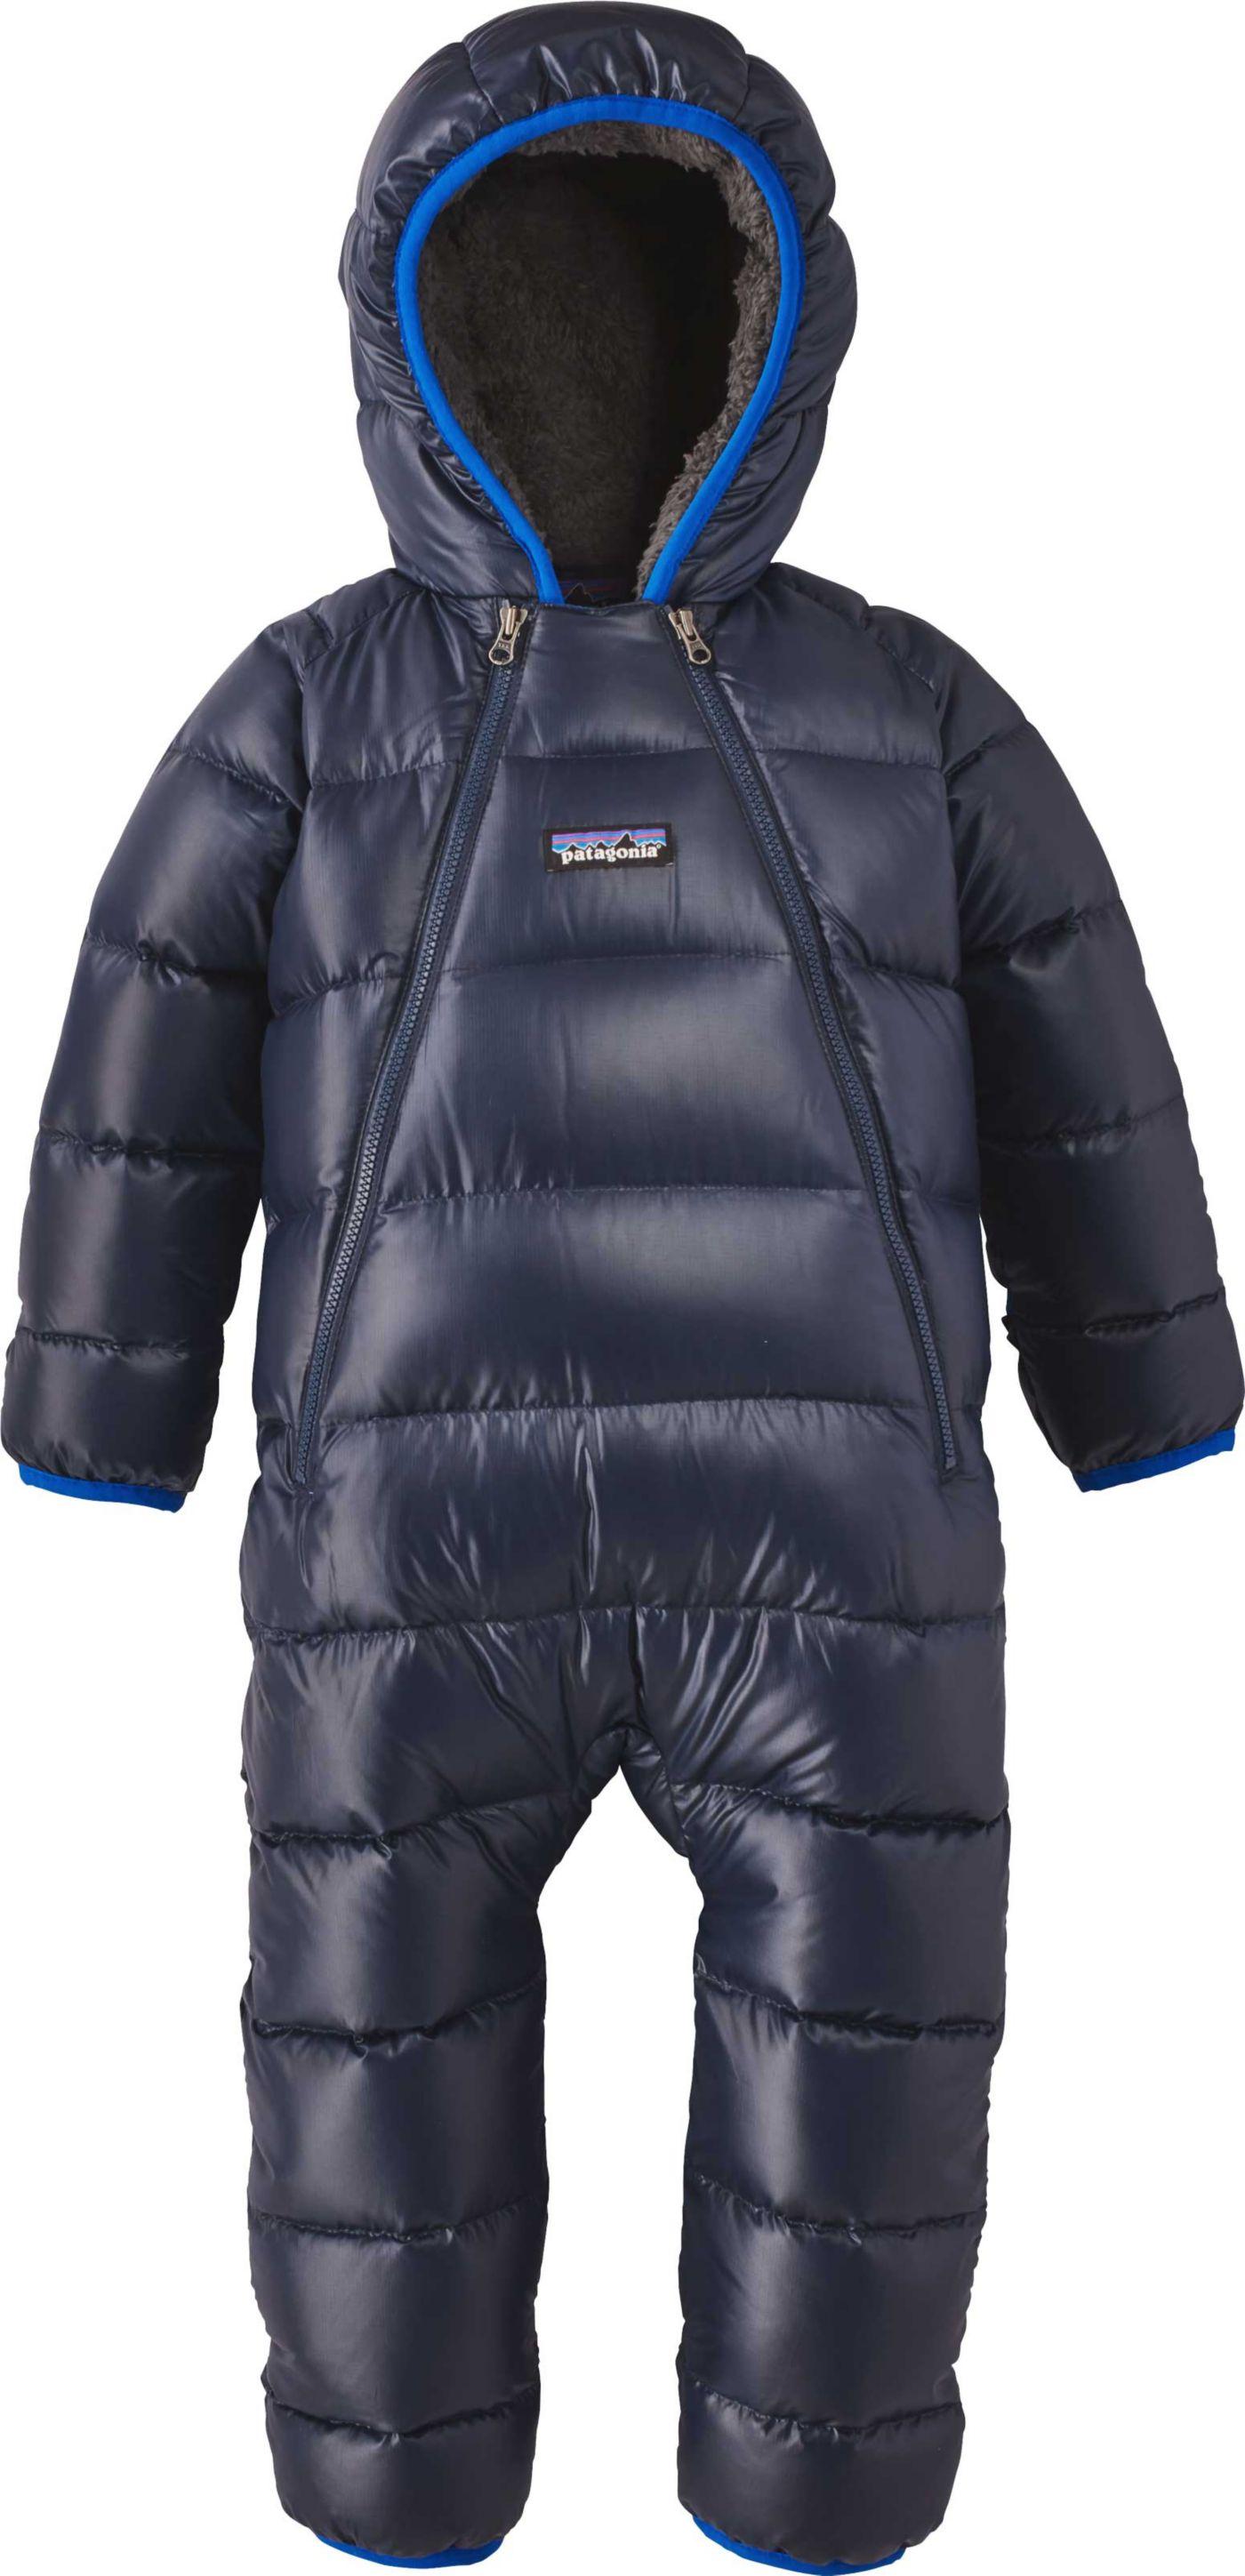 Patagonia Infant Boys' Hi-Loft Down Sweater Bunting